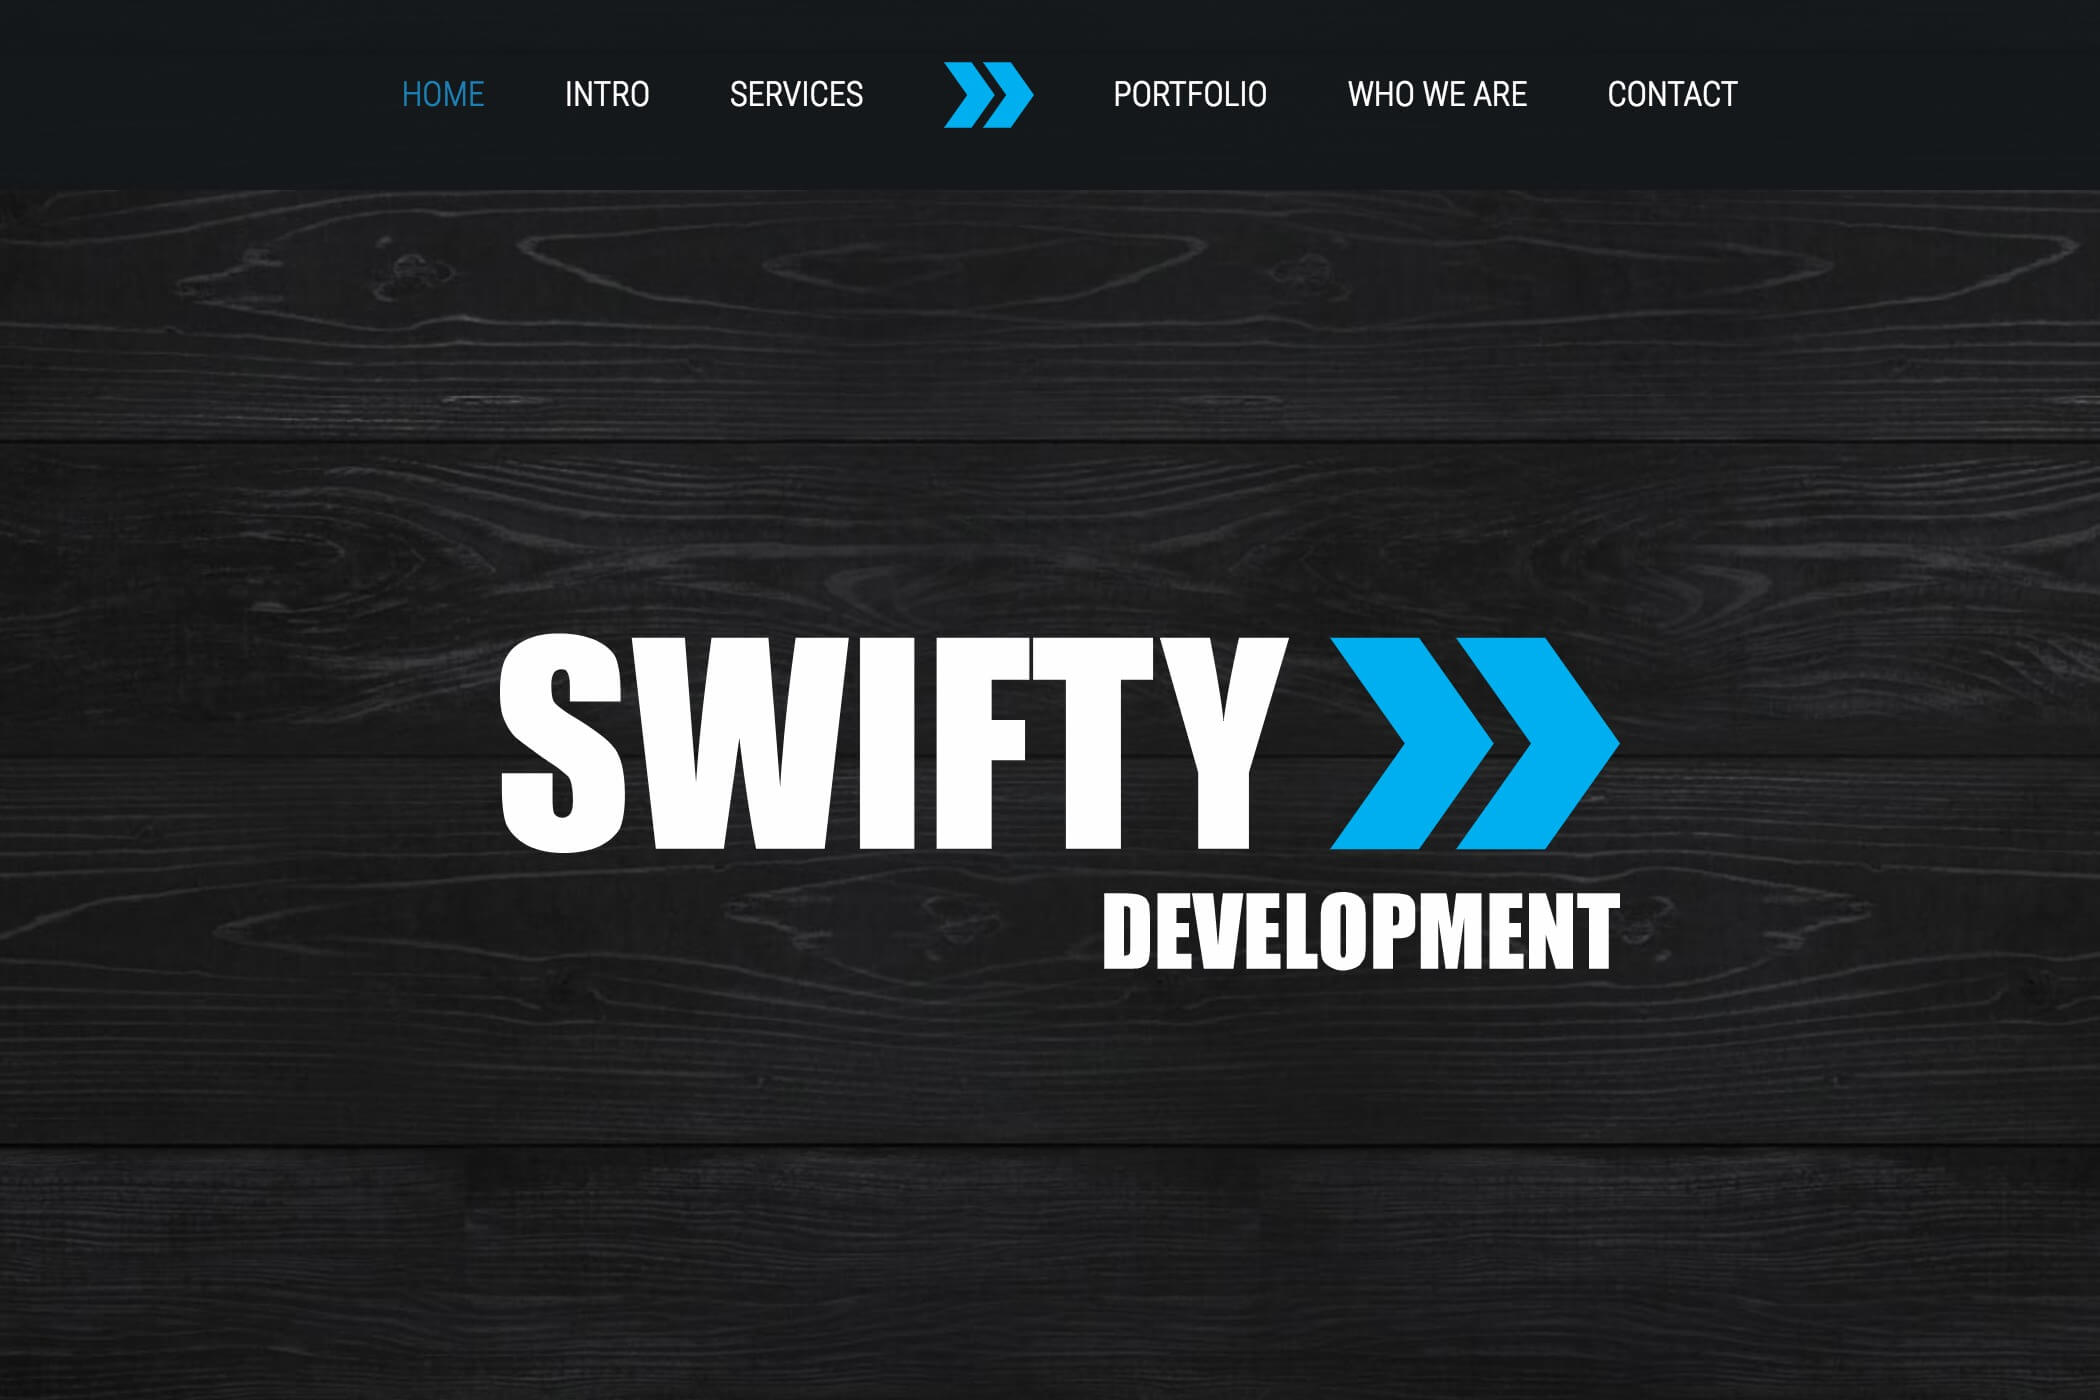 Swifty Development